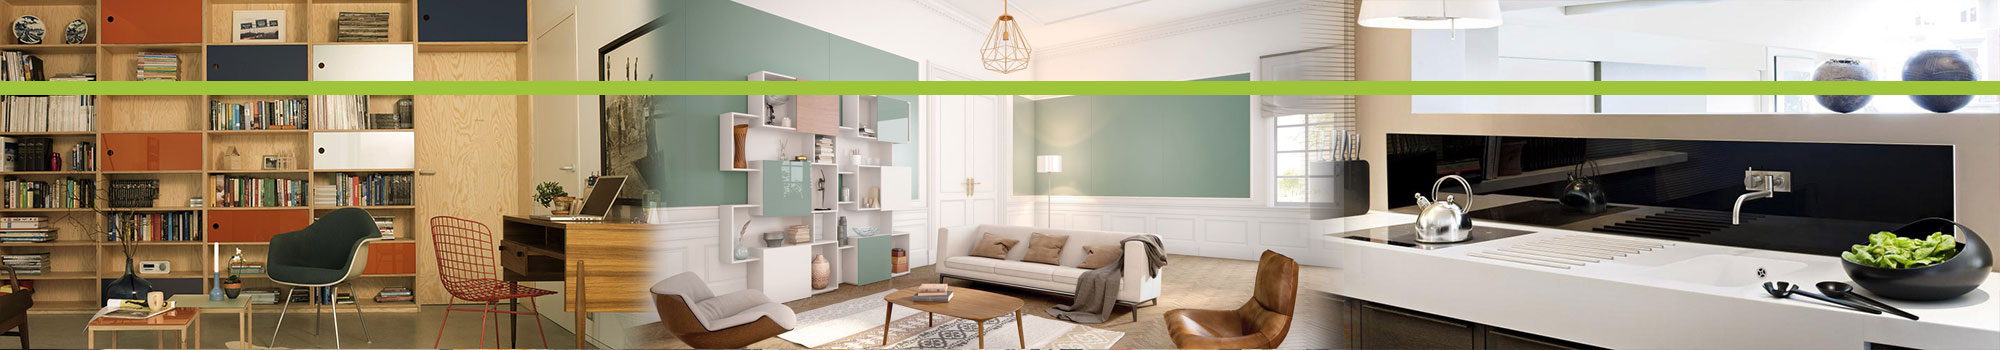 la miroiterie gamoy vitrier professionnel pour particuliers anglet. Black Bedroom Furniture Sets. Home Design Ideas